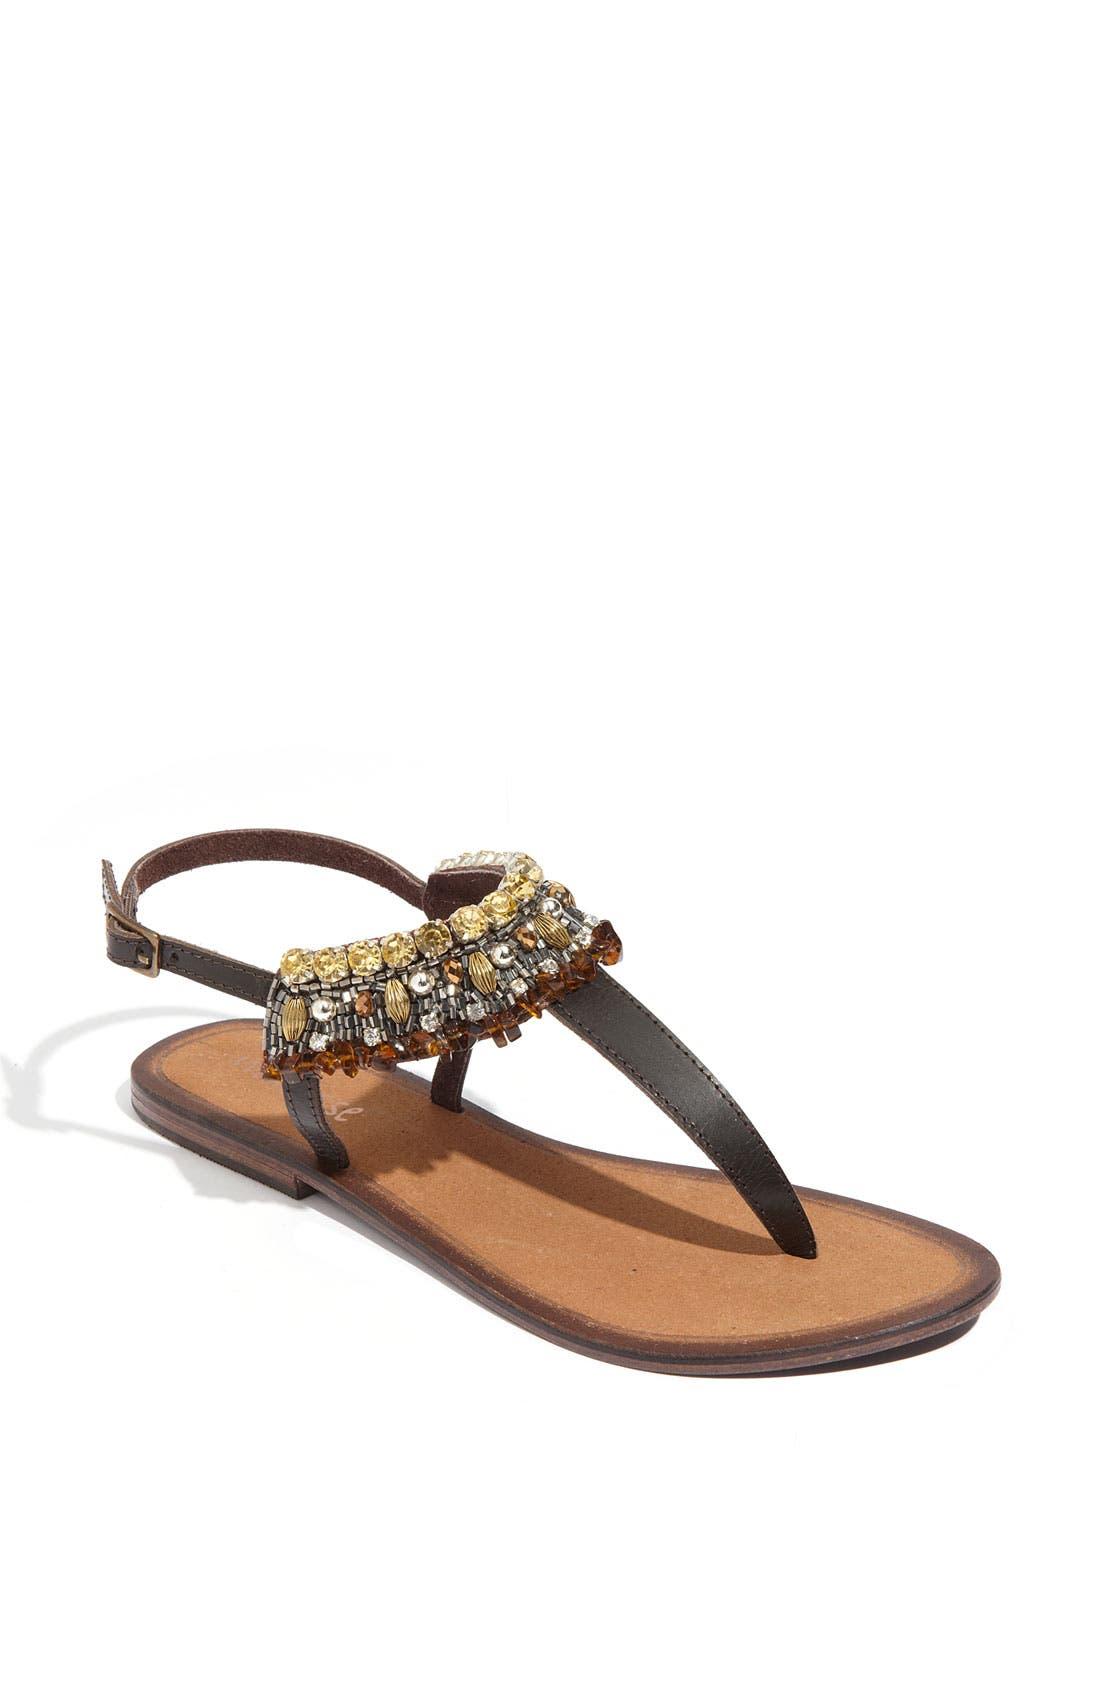 Alternate Image 1 Selected - Matisse 'Michelle' Sandal